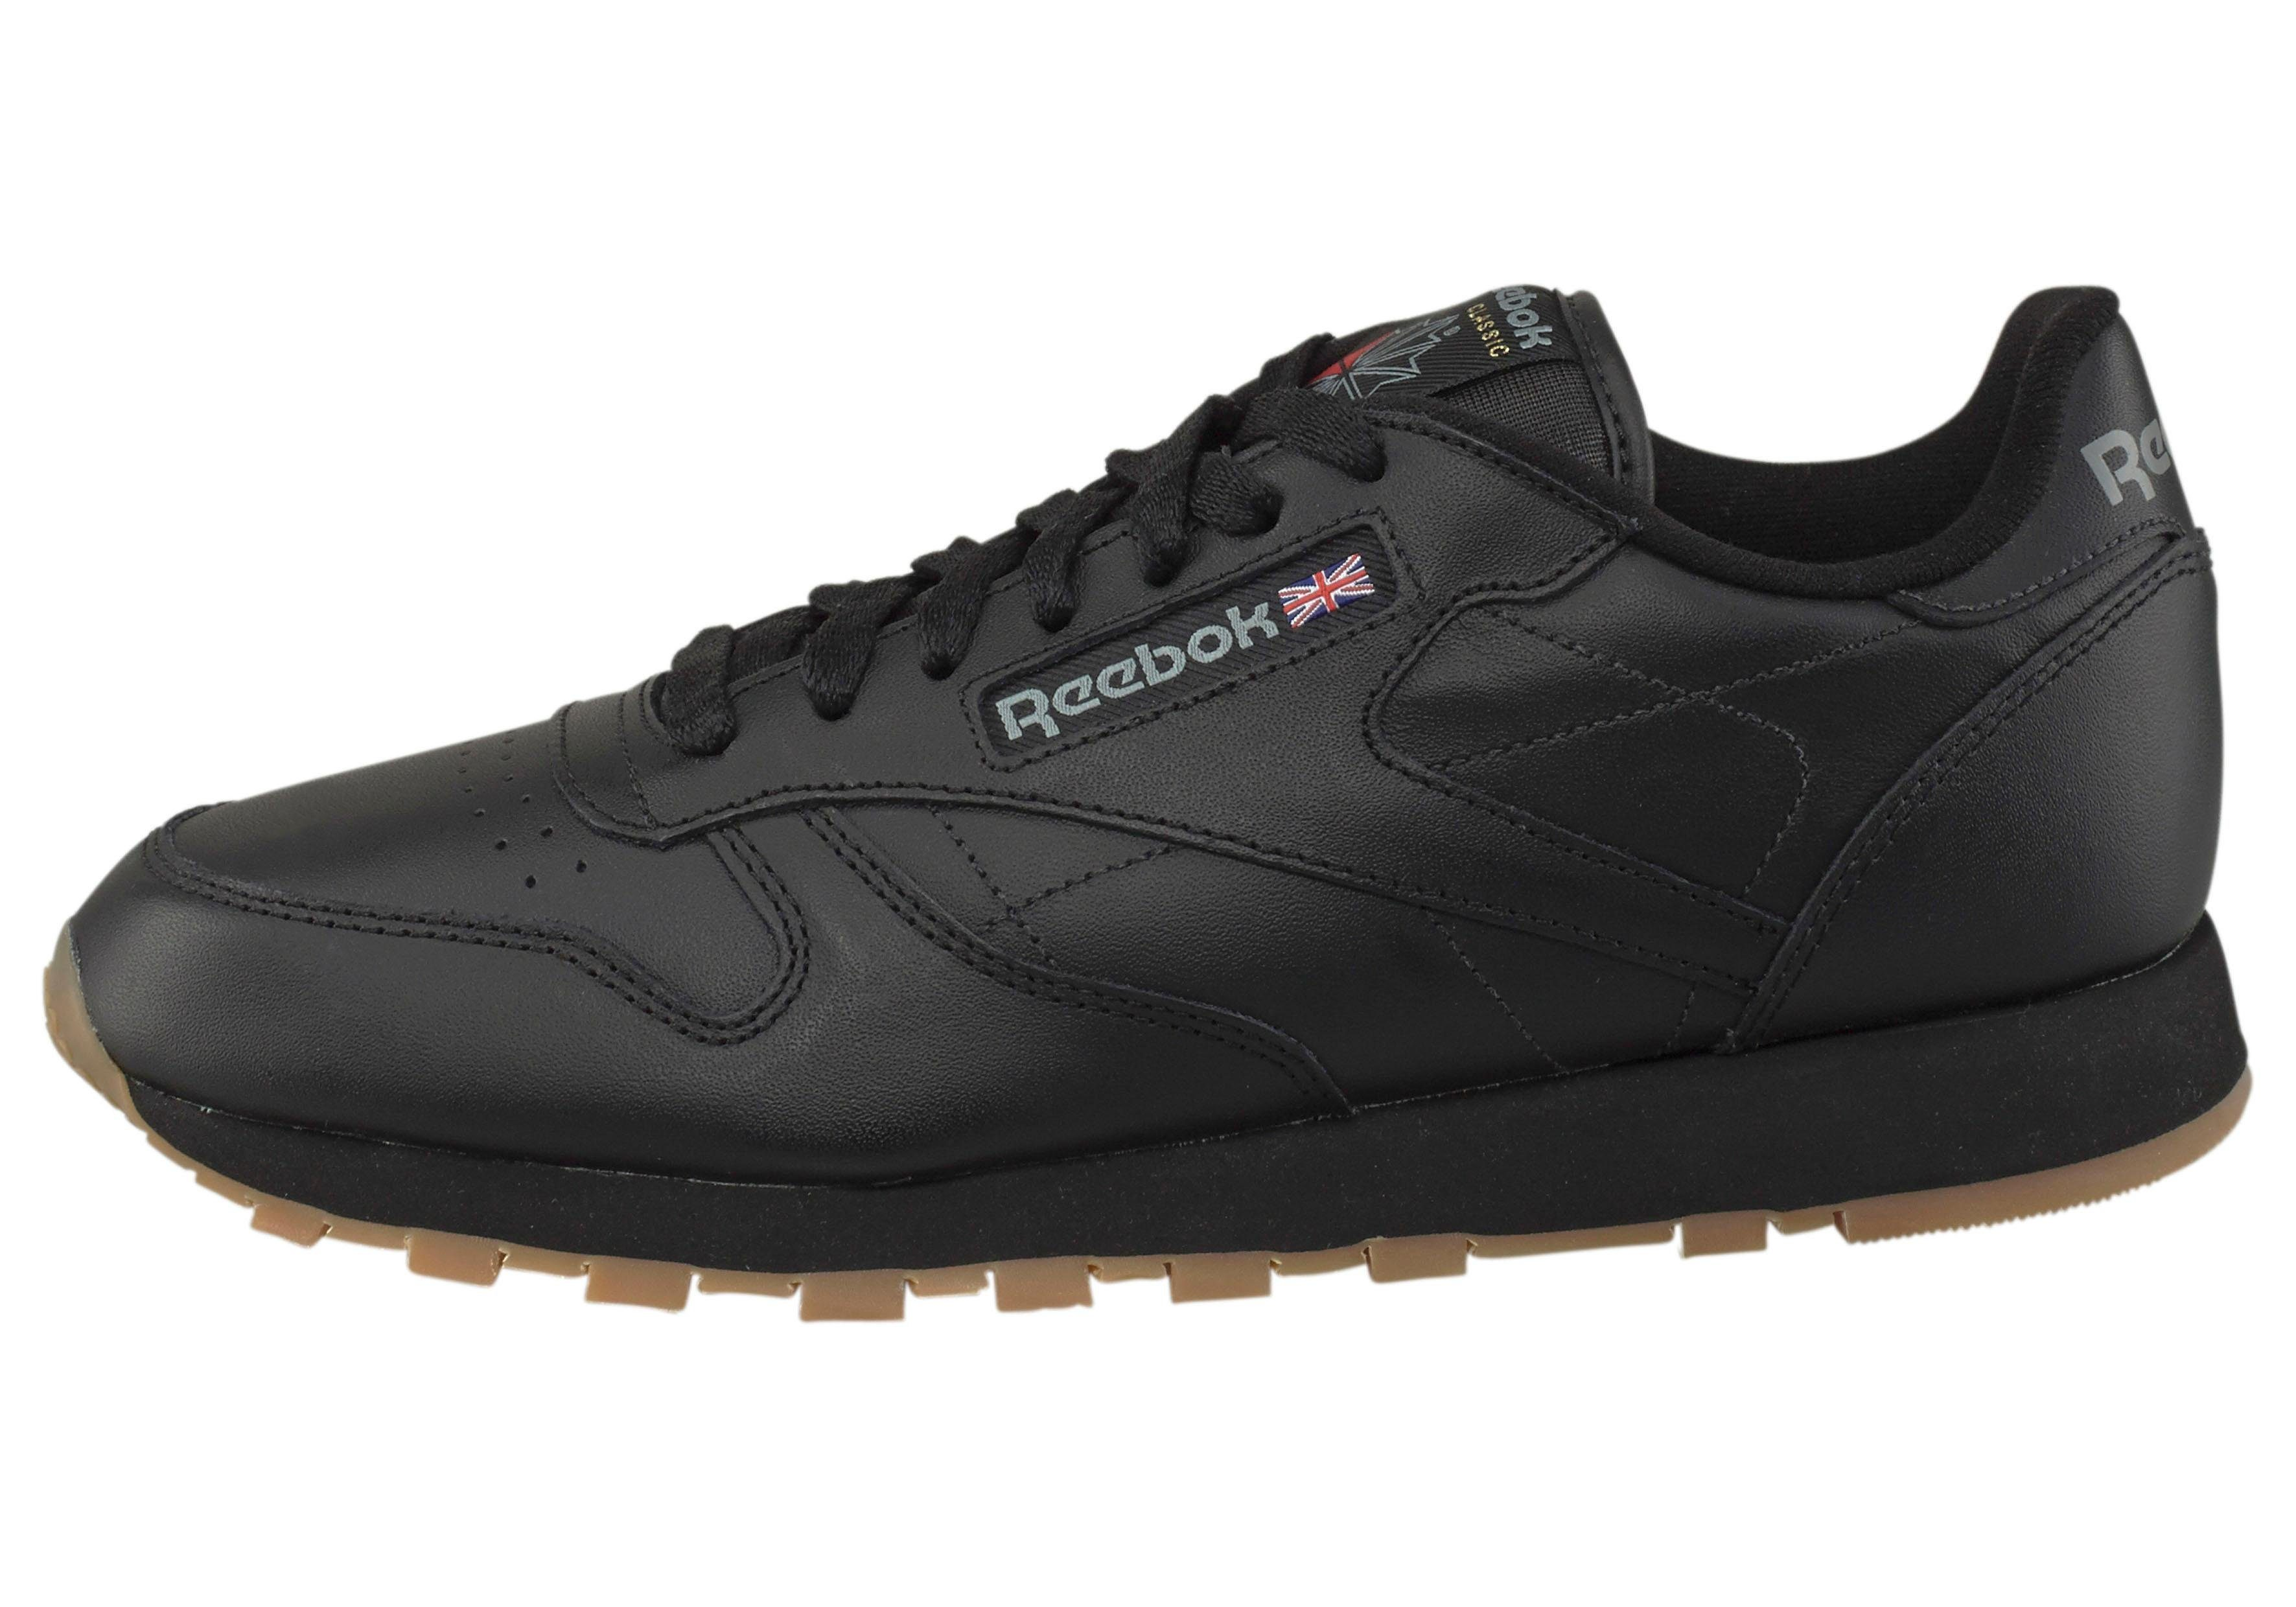 Reebok Dames Classic Leather Zwart Schoenen kopen